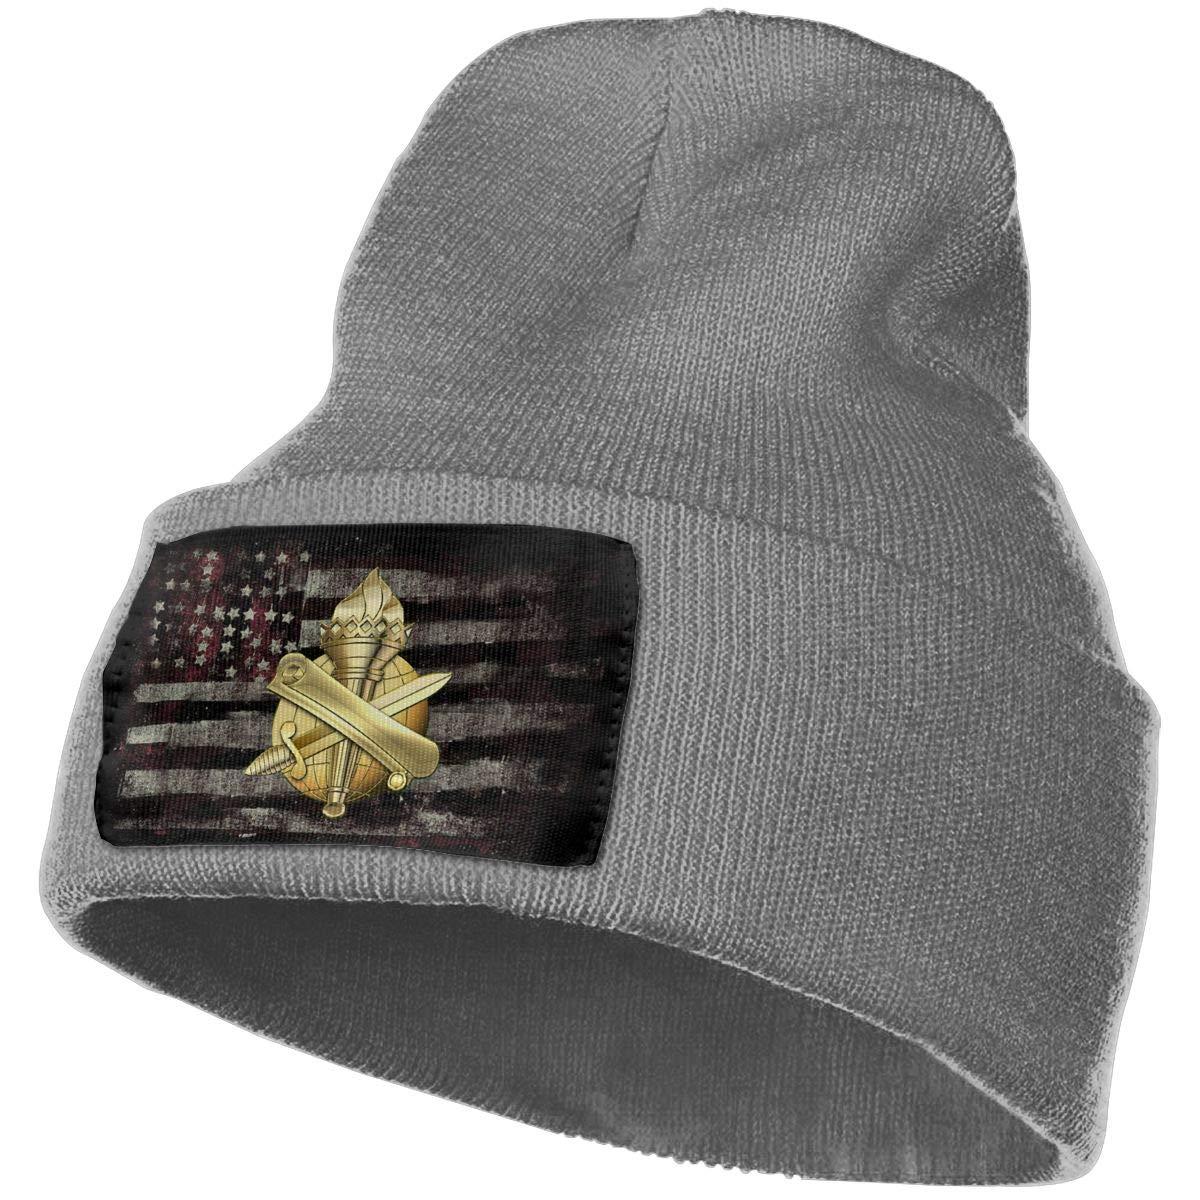 FORDSAN CP Civil Affairs Regimental Branch1 Mens Beanie Cap Skull Cap Winter Warm Knitting Hats.